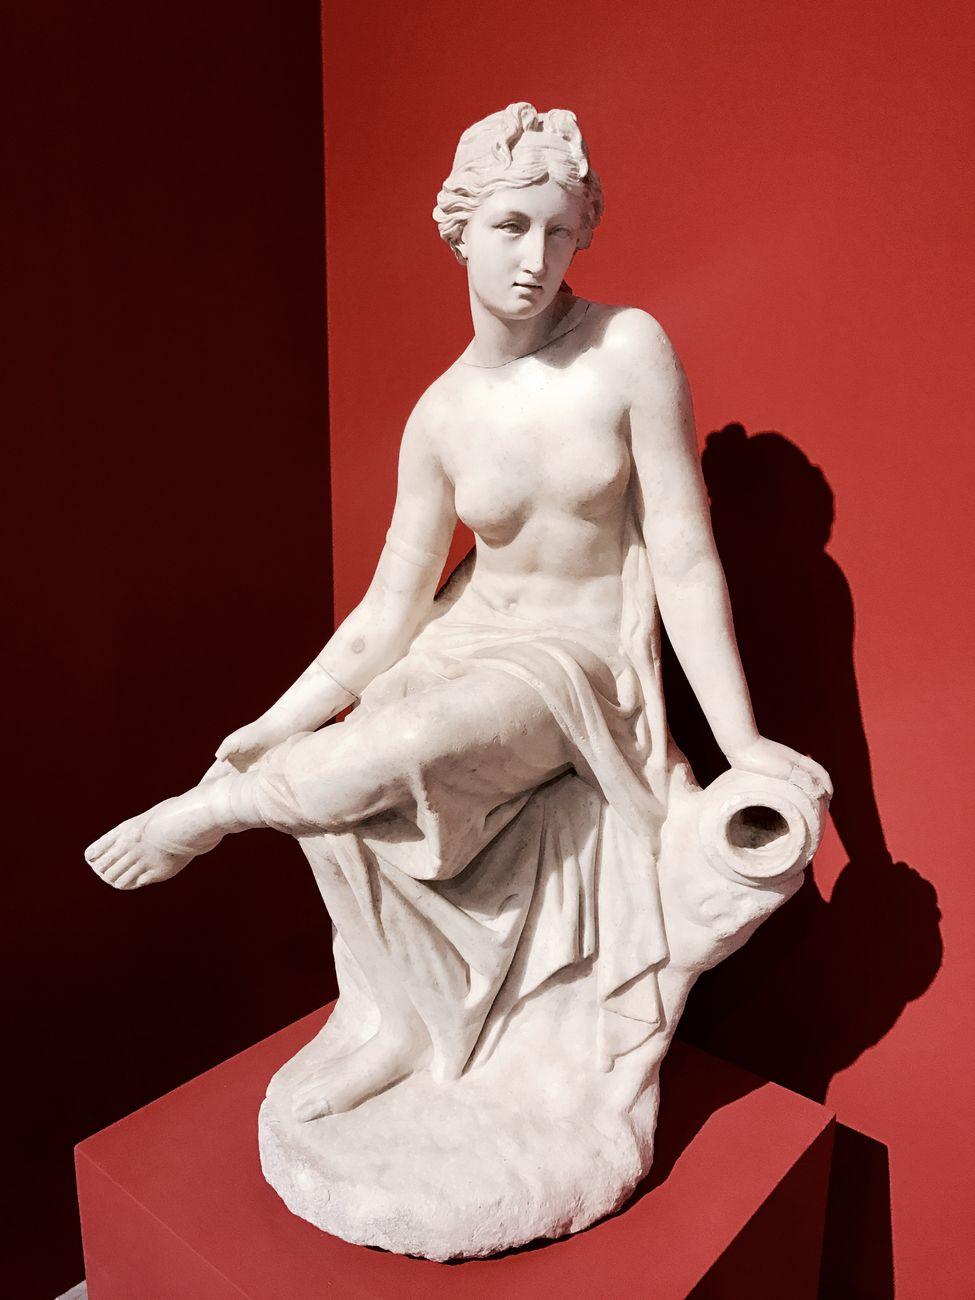 Statua di ninfa in marmo, I sec d.C. Photo Helga Marsala. Museo Archeologico Regionale Antonino Salinas, Palermo